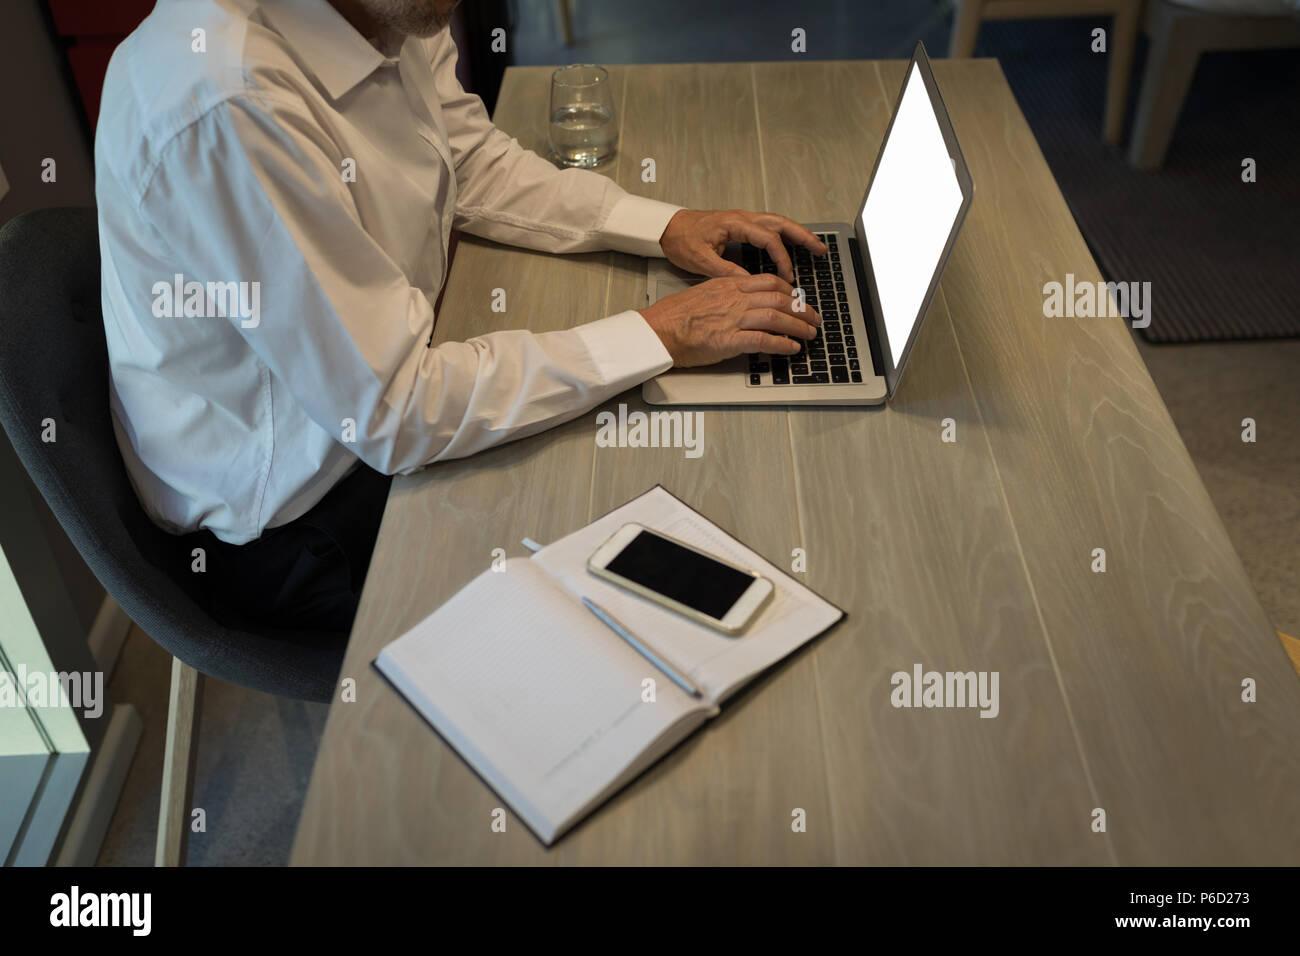 Businessman using a laptop at desk Stock Photo